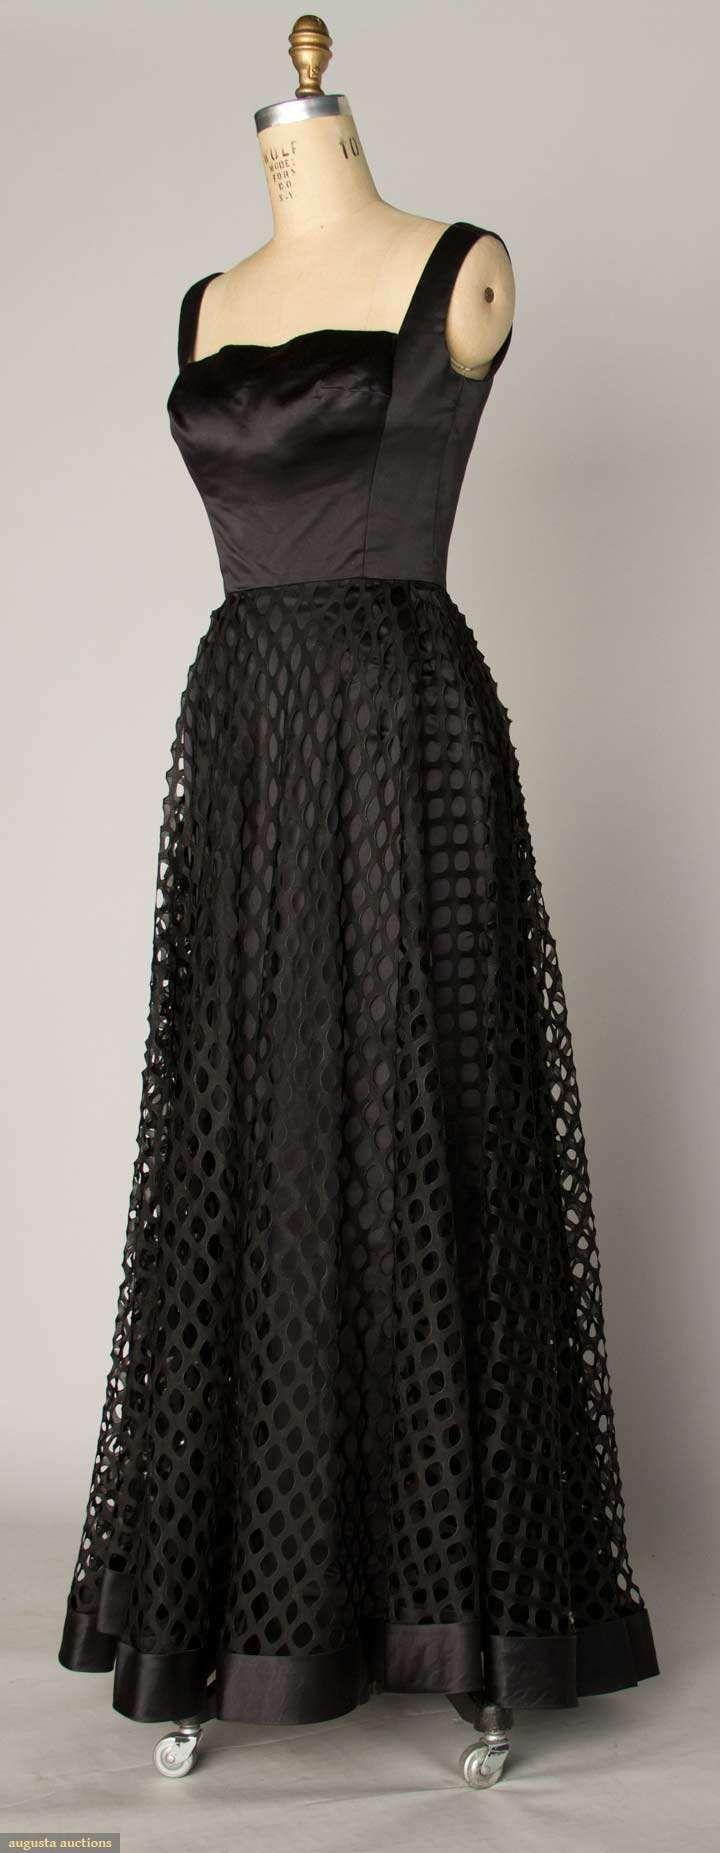 Augusta auctions womenus vintage fashion shannon rodgers evening